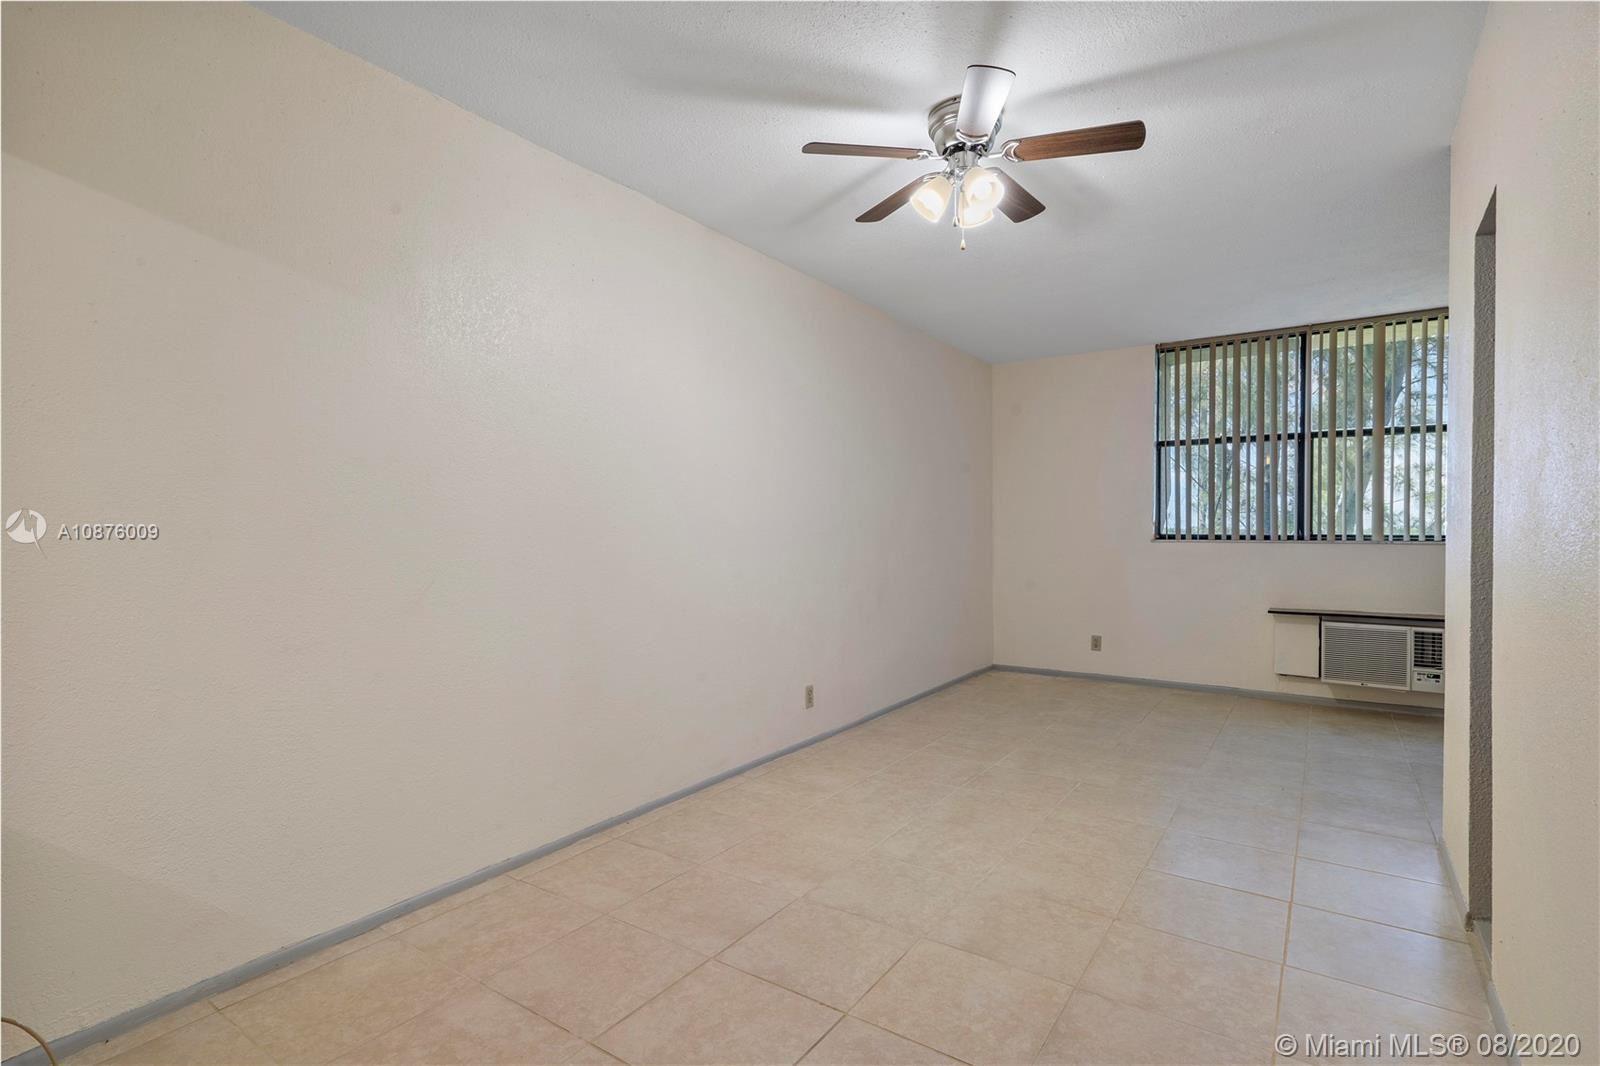 2401 Riverside Dr #502-B, Coral Springs, FL 33065 - #: A10876009